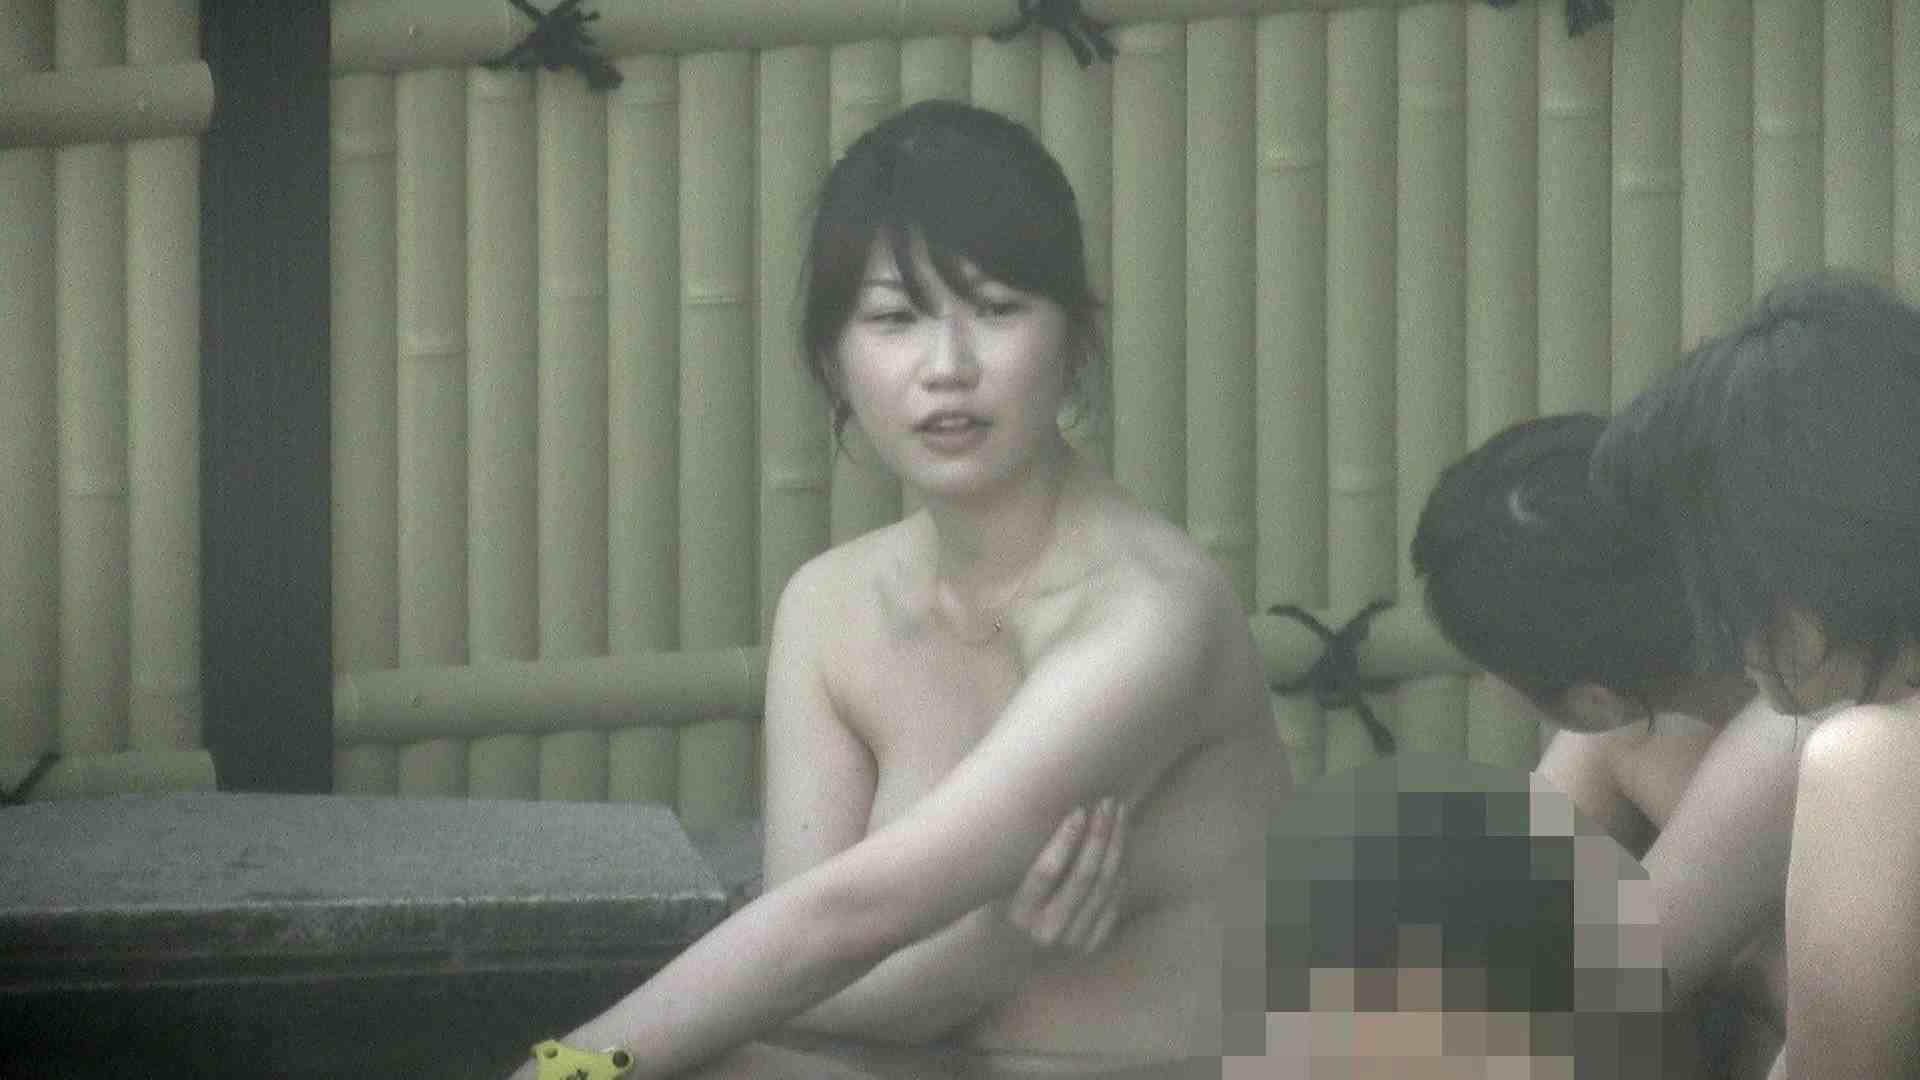 Aquaな露天風呂Vol.206 OL女体 オマンコ動画キャプチャ 80連発 59